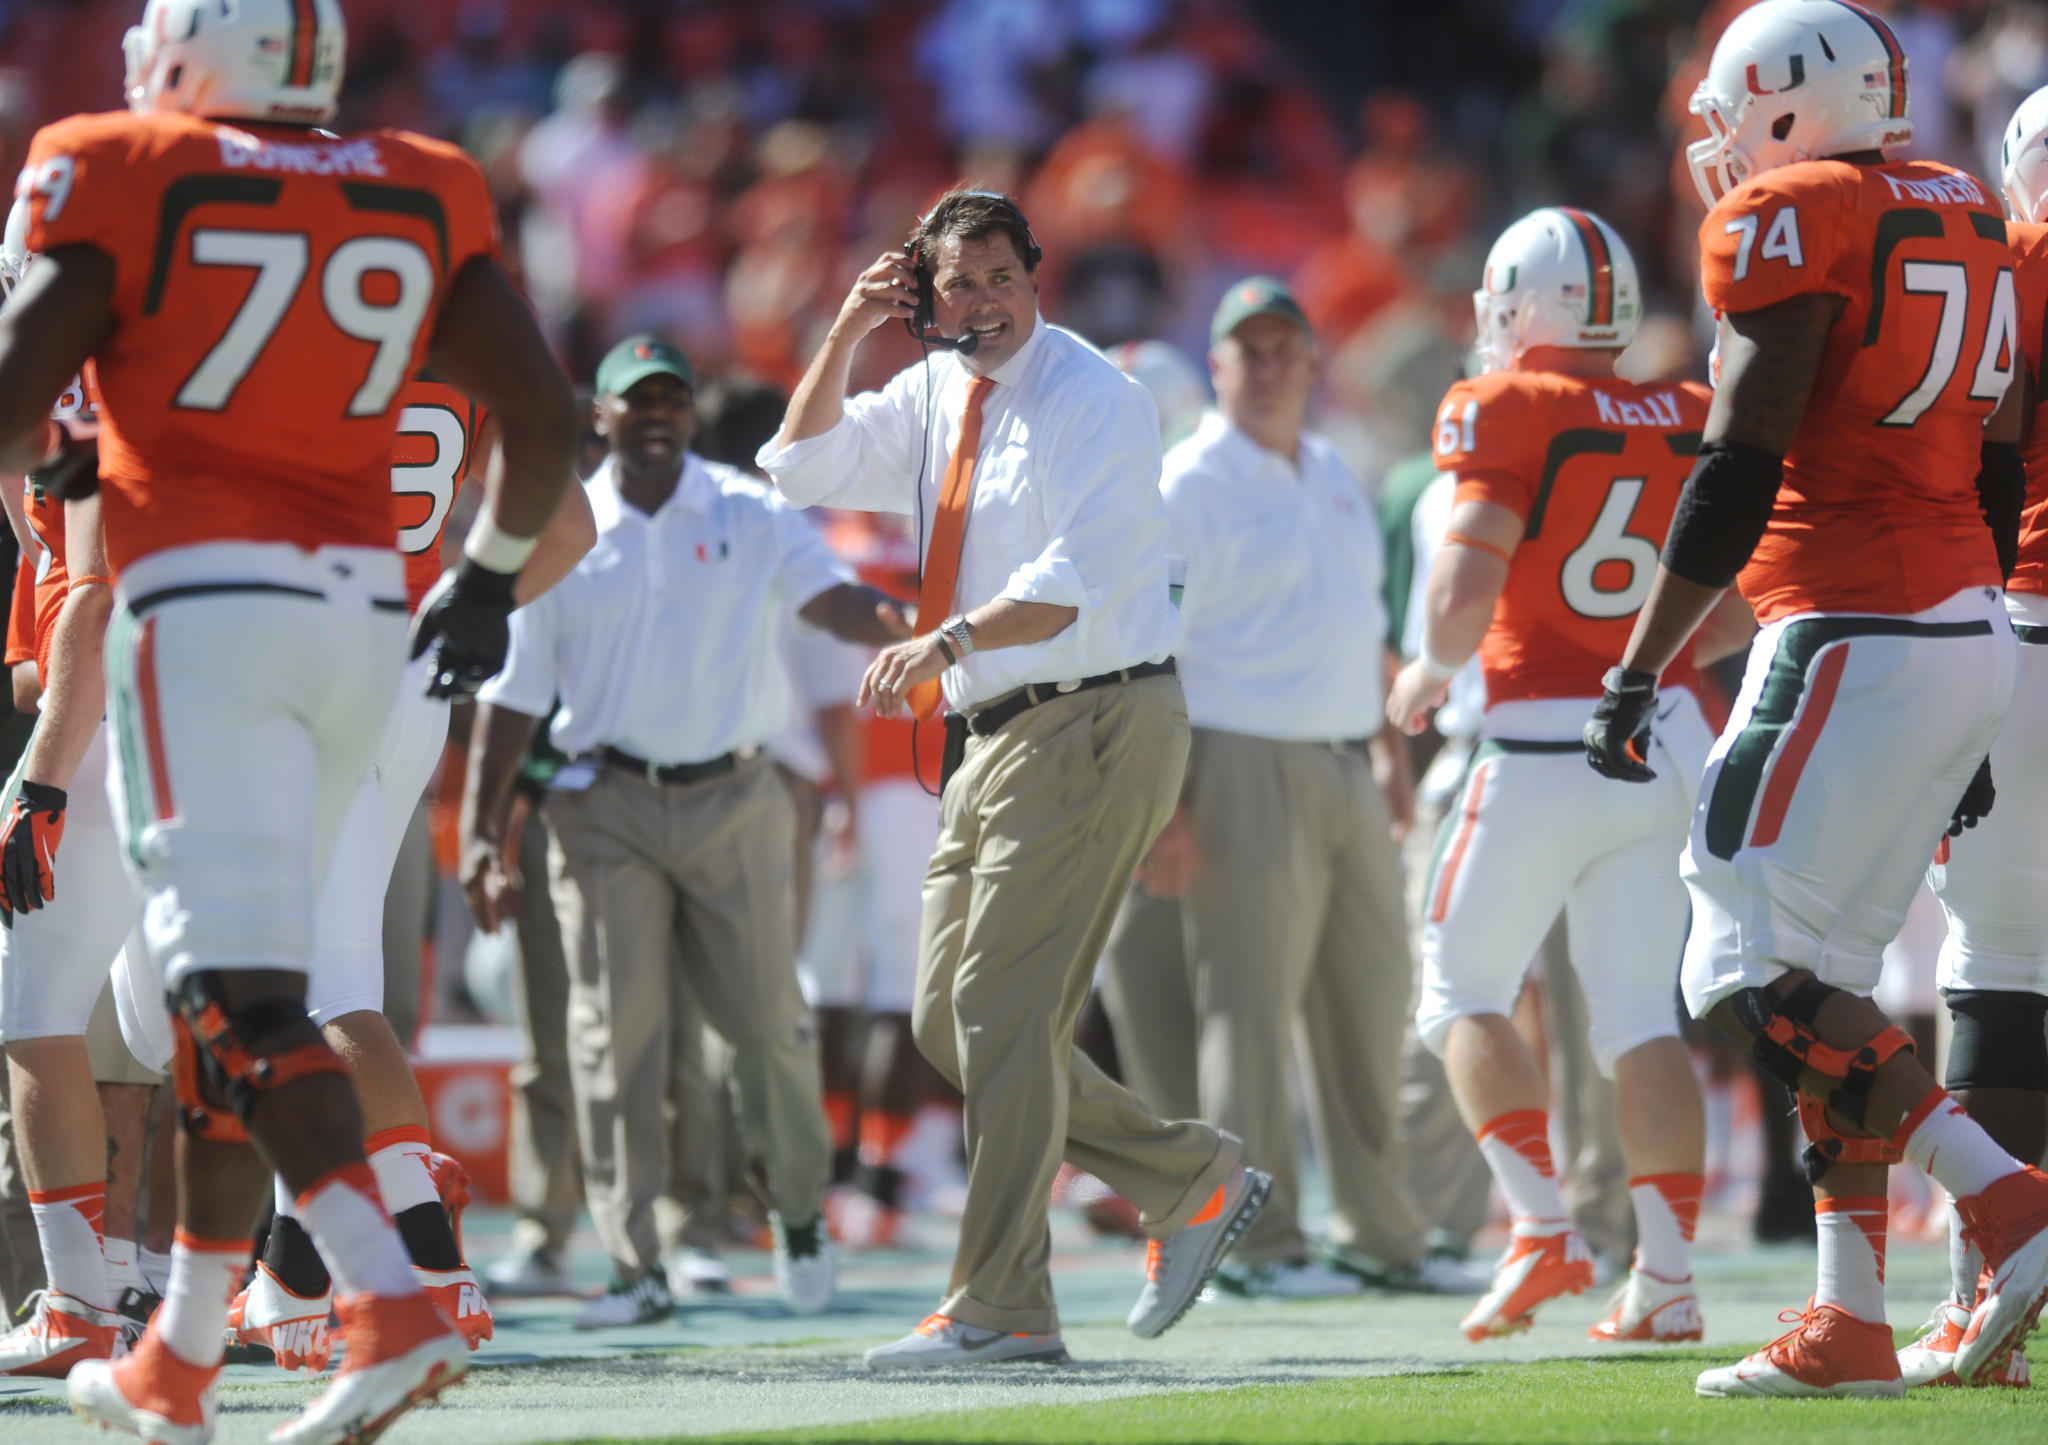 University of Miami head coach Al Golden keeps his team focused against Georgia Tech. Georgia Tech at University of Miami, Sun Life Stadium, Miami Gardens, FL. 10/5/13. Jim Rassol, Sun Sentinel...